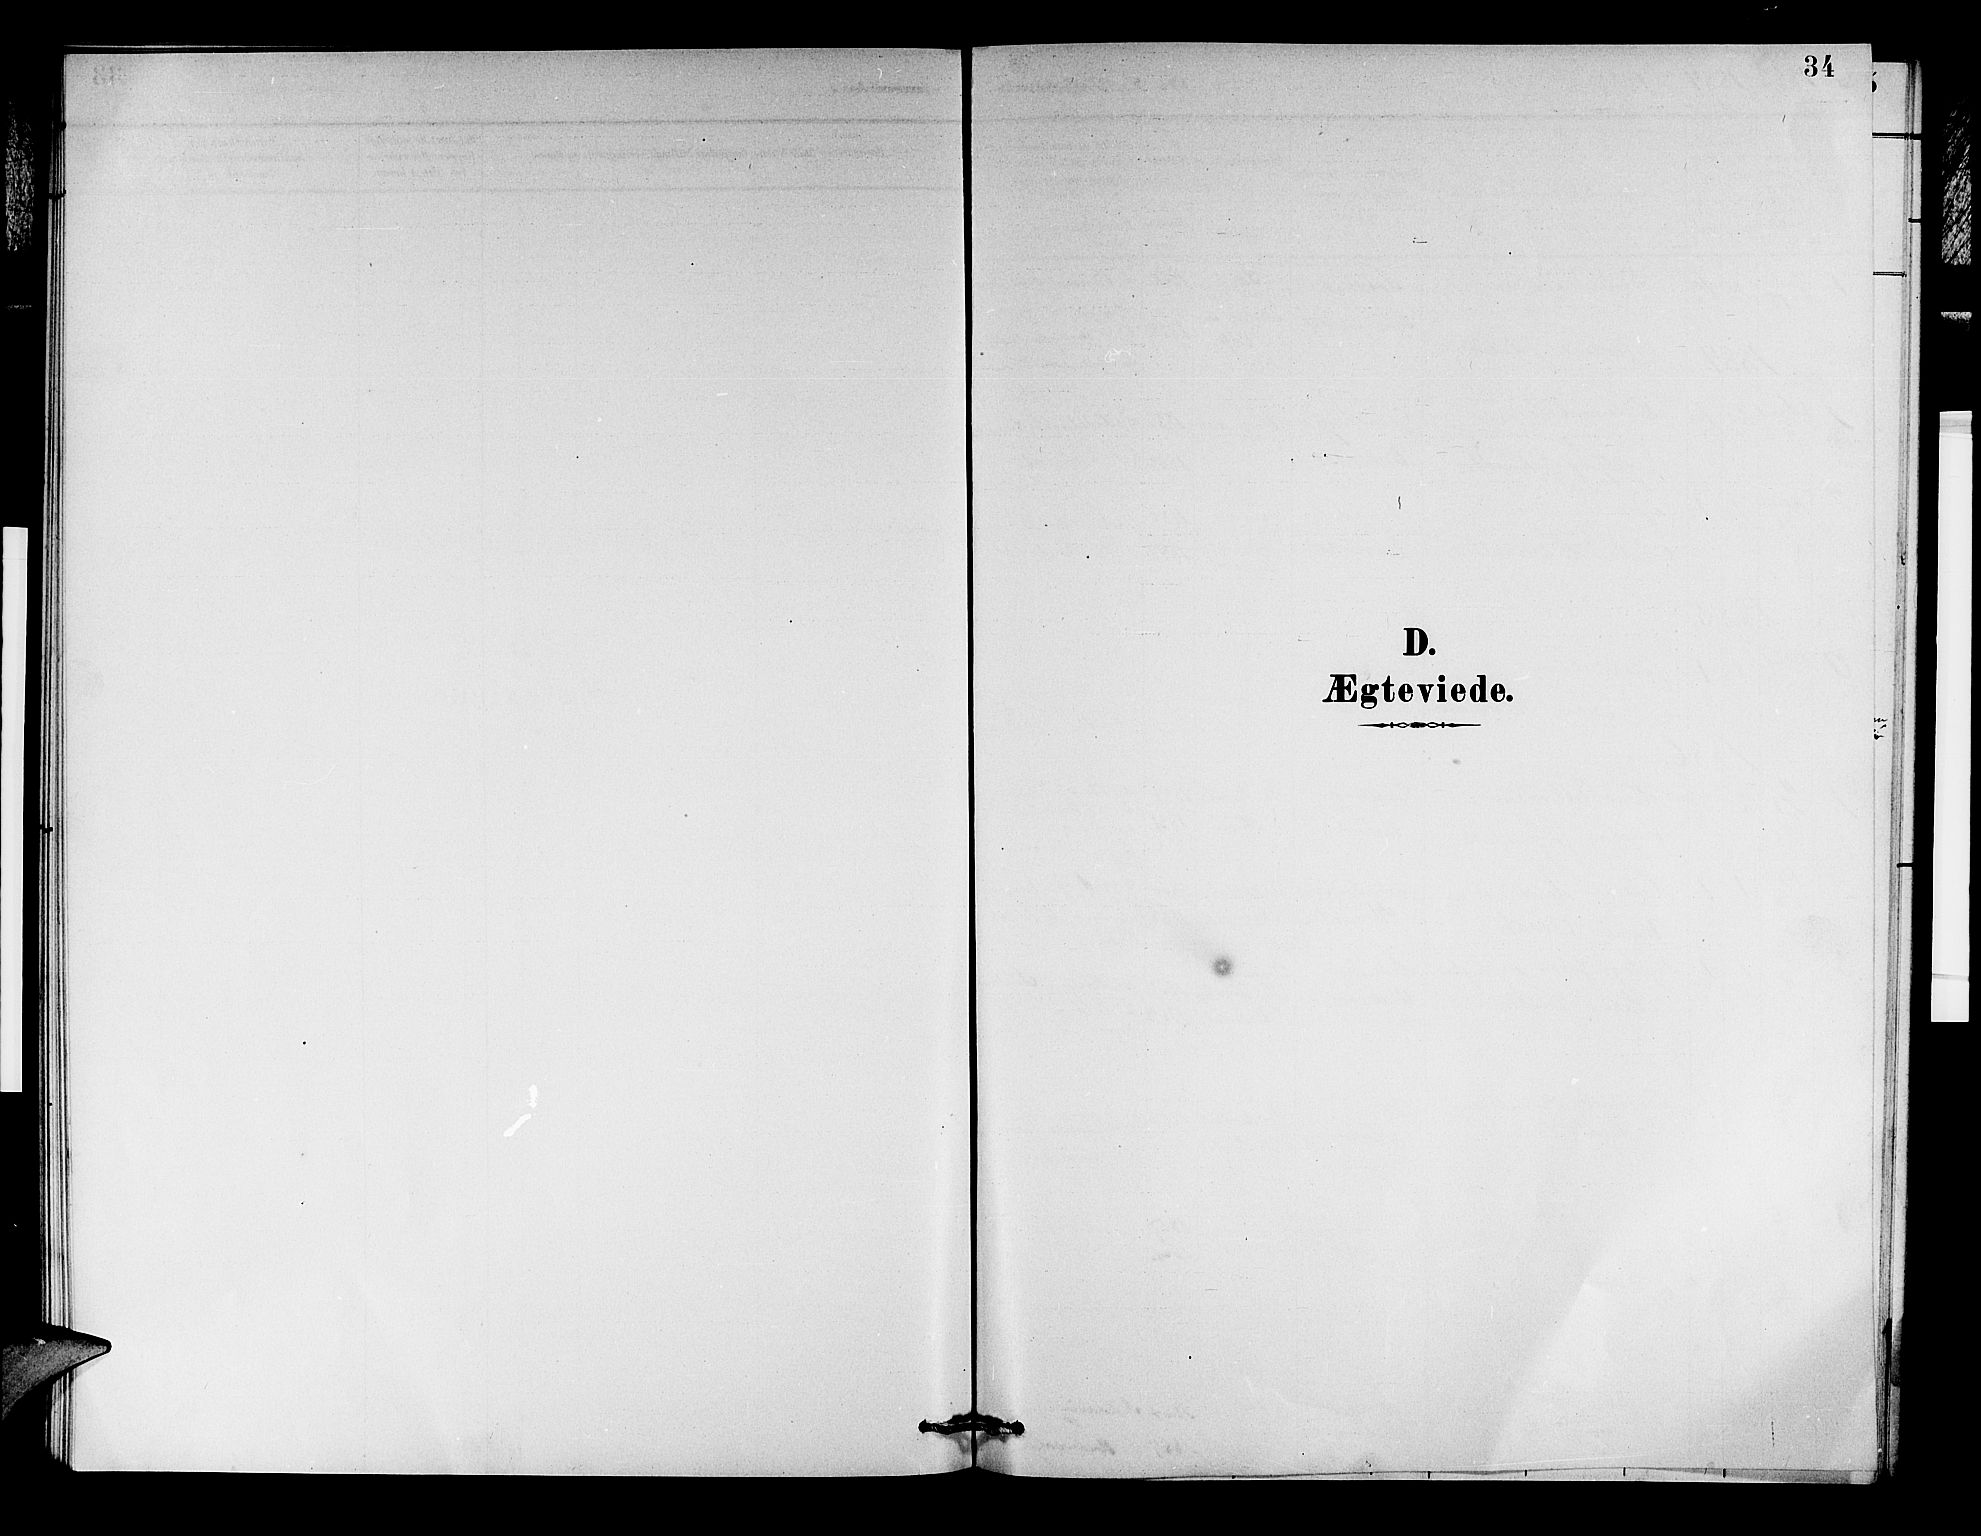 SAB, Aurland Sokneprestembete*, Klokkerbok nr. D 2, 1883-1920, s. 34